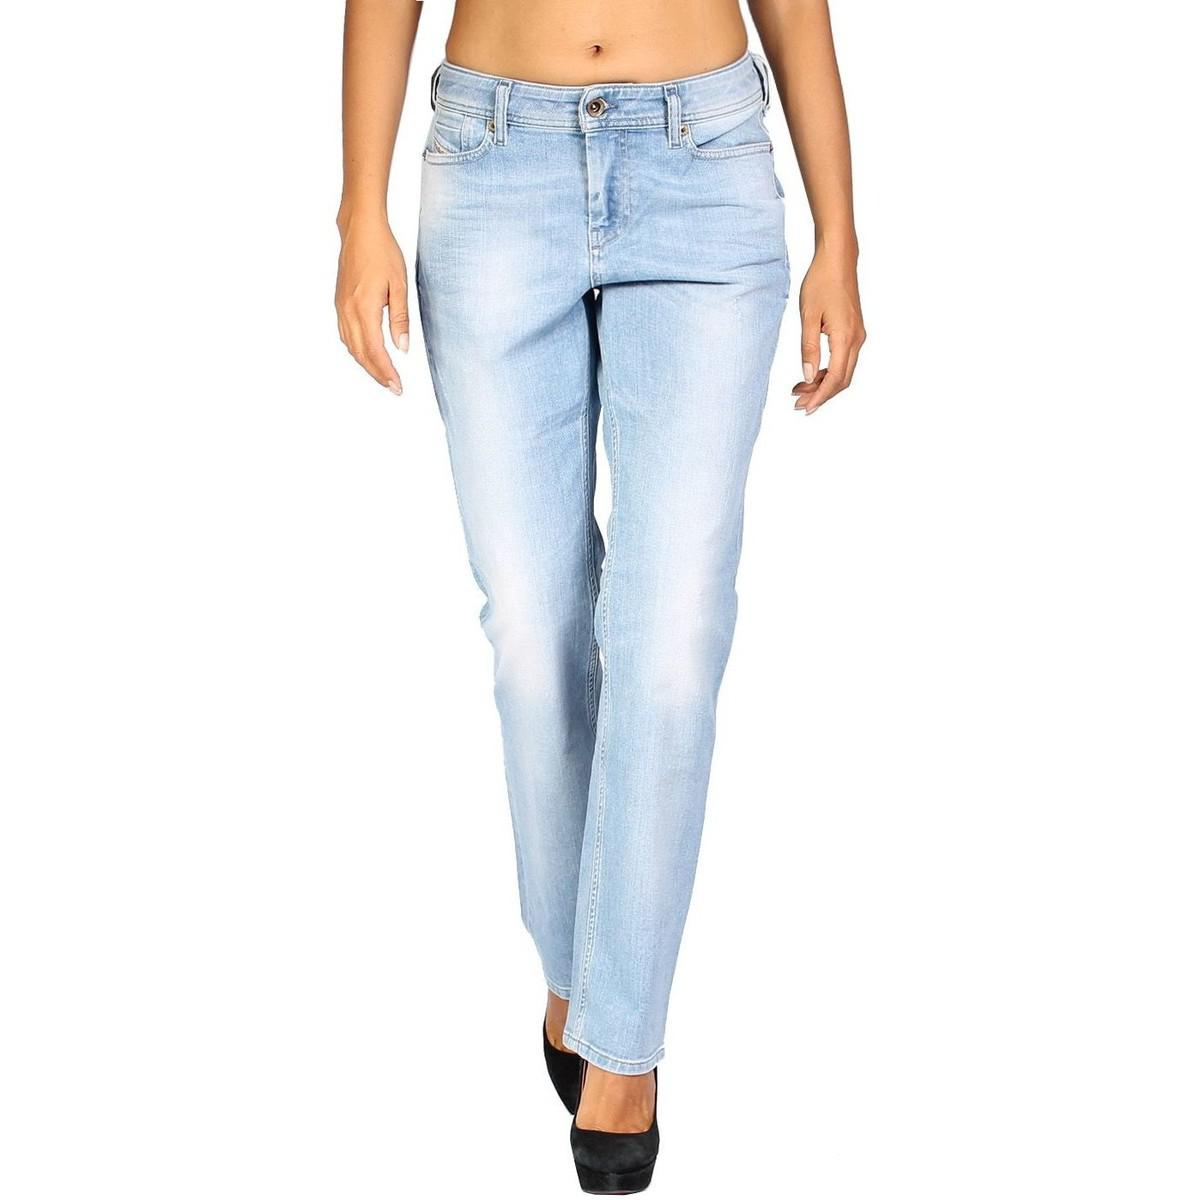 38256e19 DIESEL. - Women's Jeans Reen 839g - Regular Straight Women's Jeans In Blue